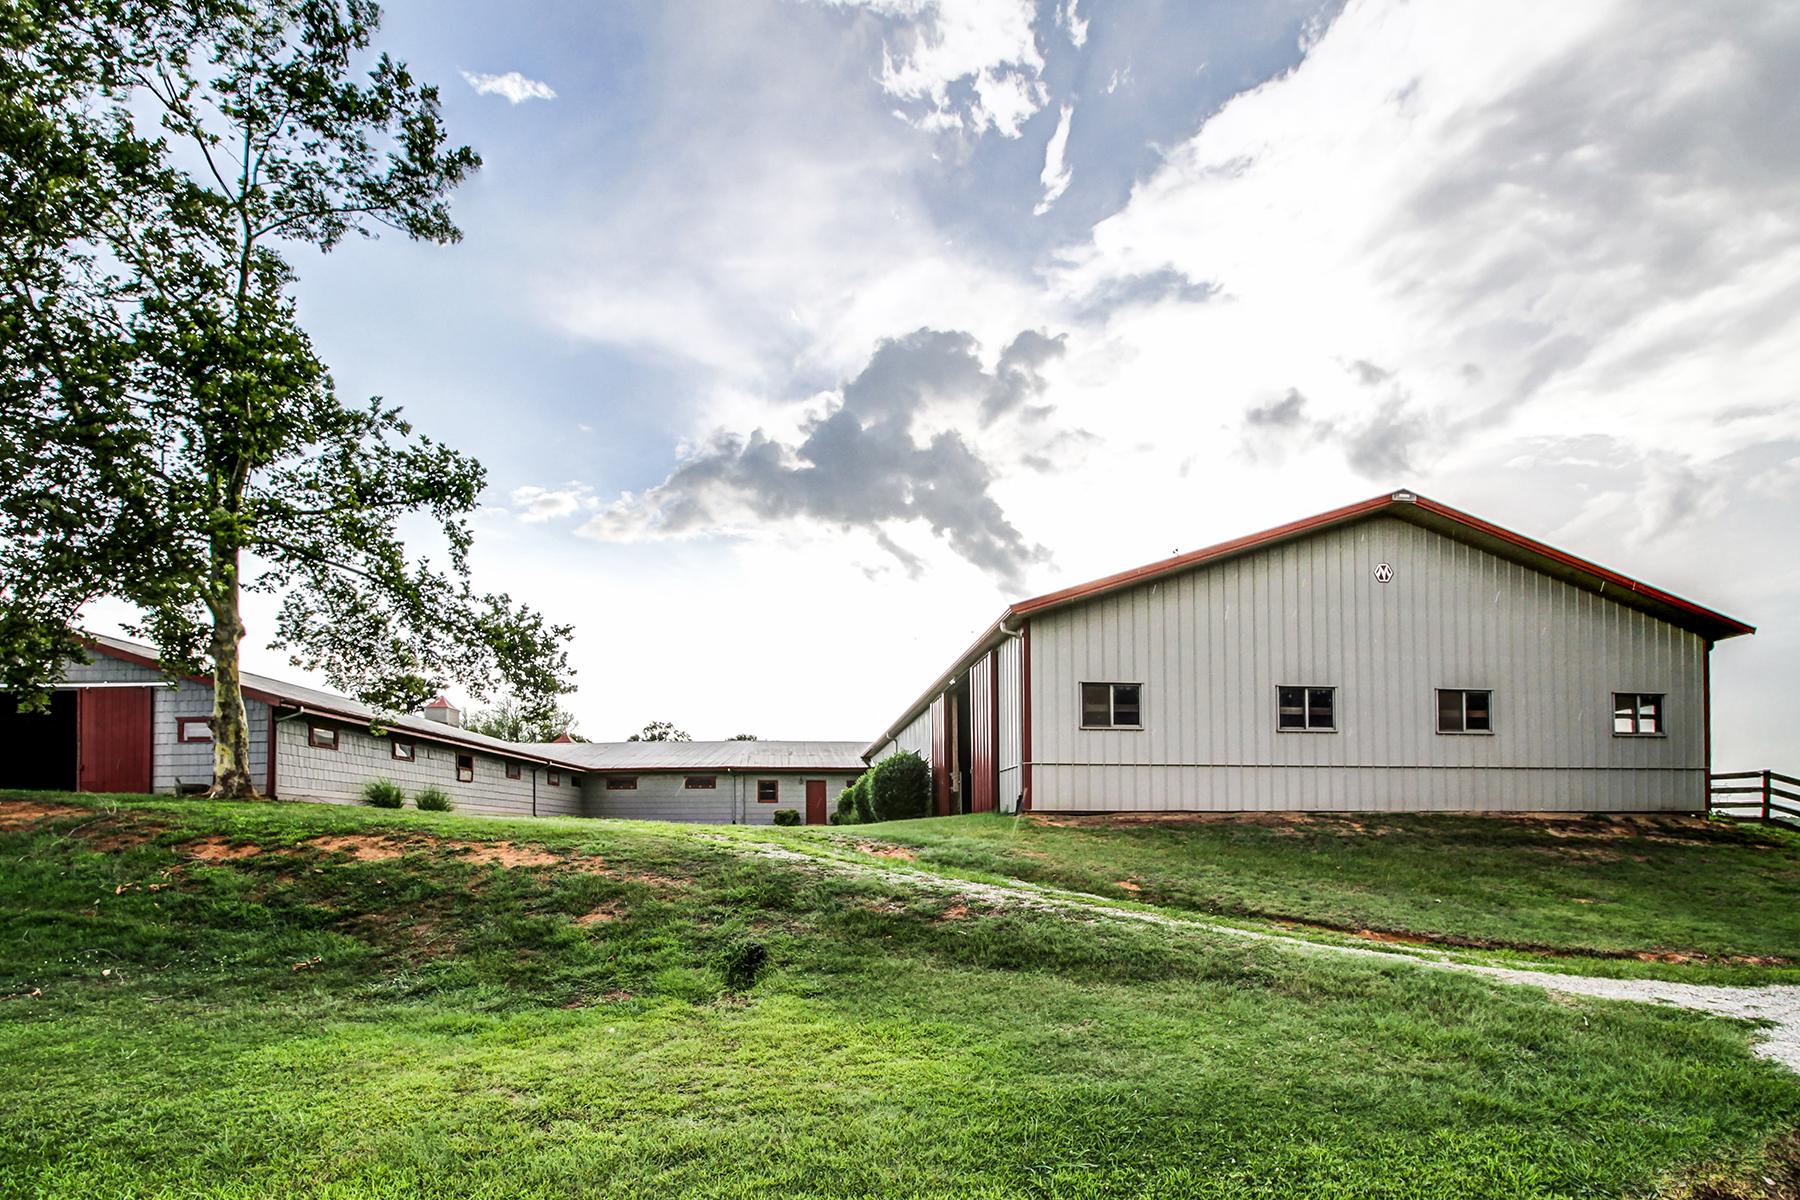 Additional photo for property listing at UNIQUE EQUESTRIAN ESTATE 151  Lake Hill Farm Rd,  Mooresboro, North Carolina 28114 United States